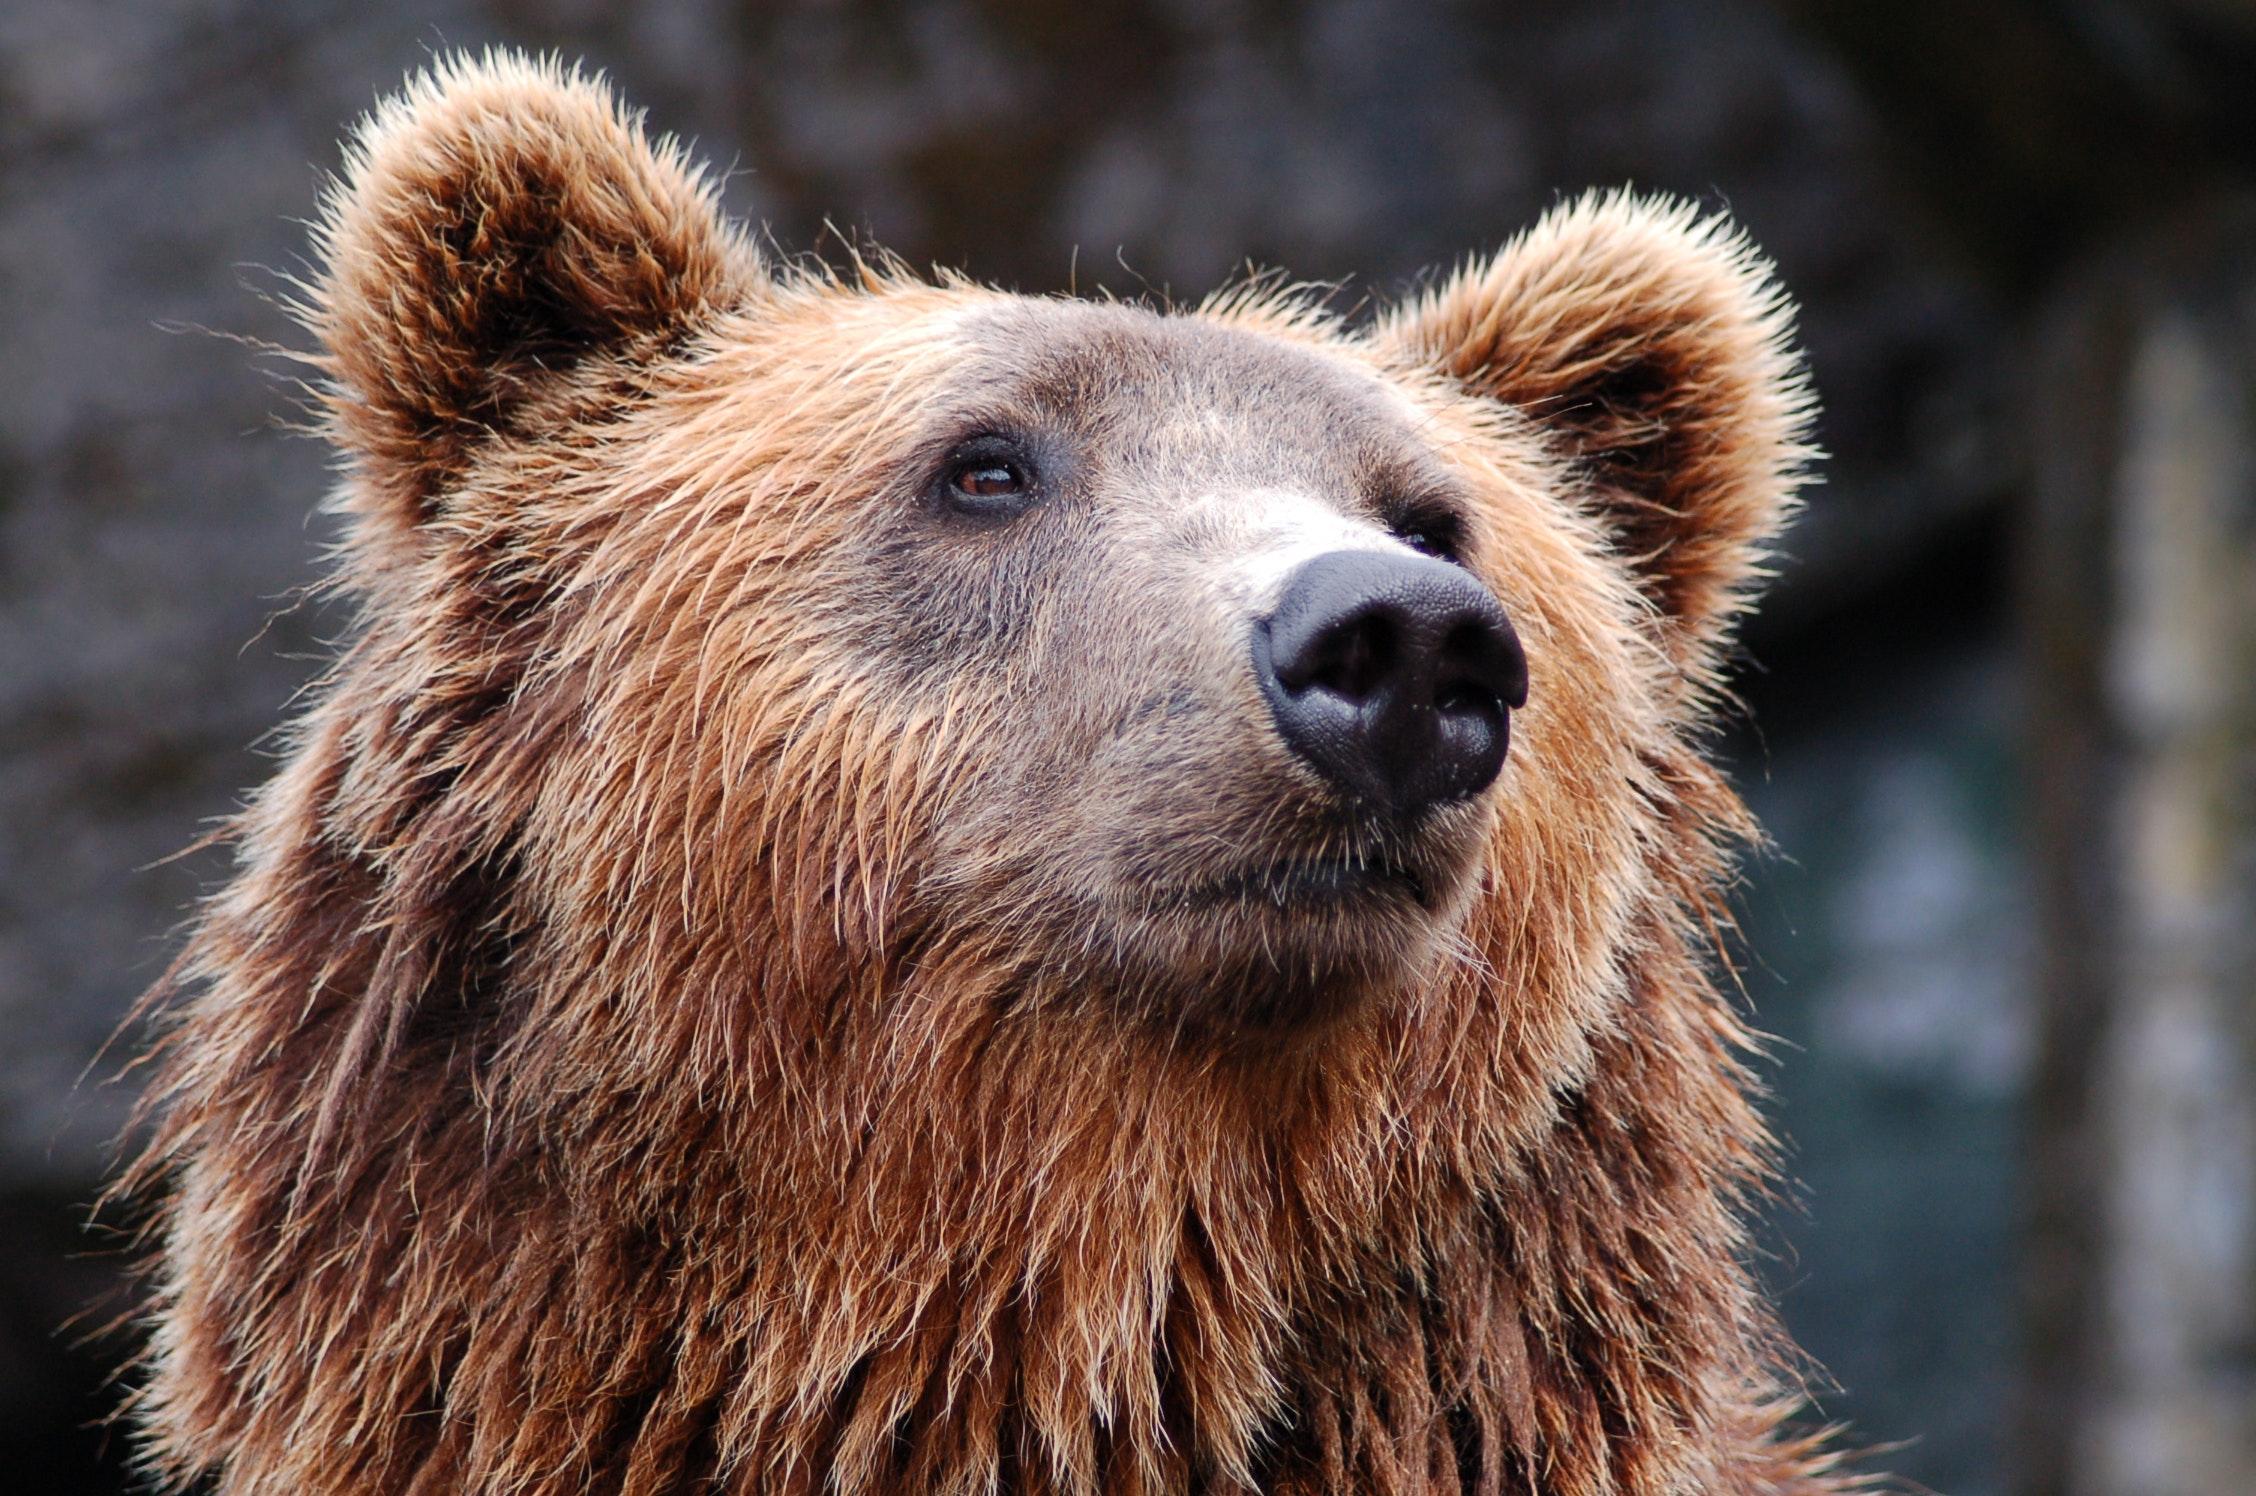 animal-bear-brown-bear-35435.jpg